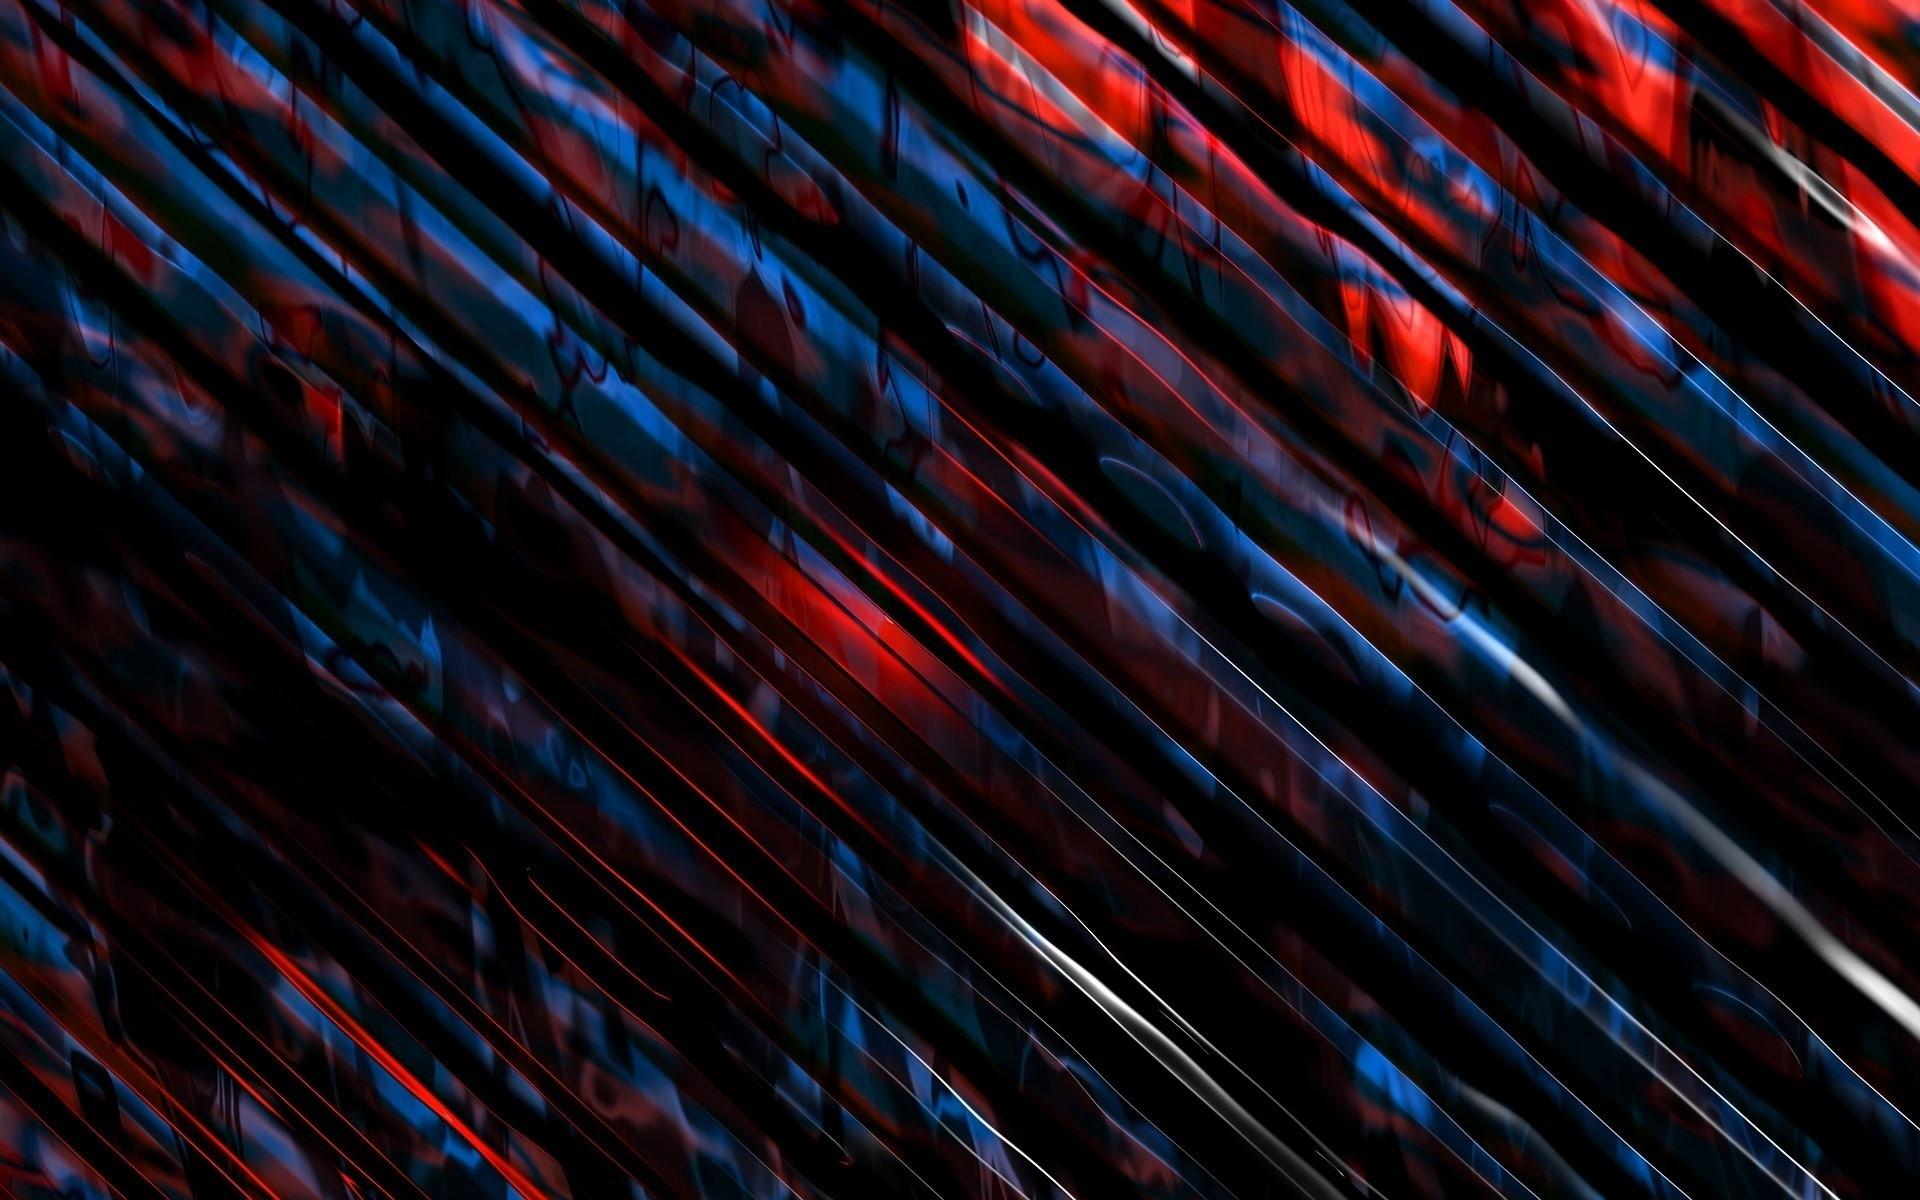 Abstract Dark Wallpaper Iphone - HD Wallpaper